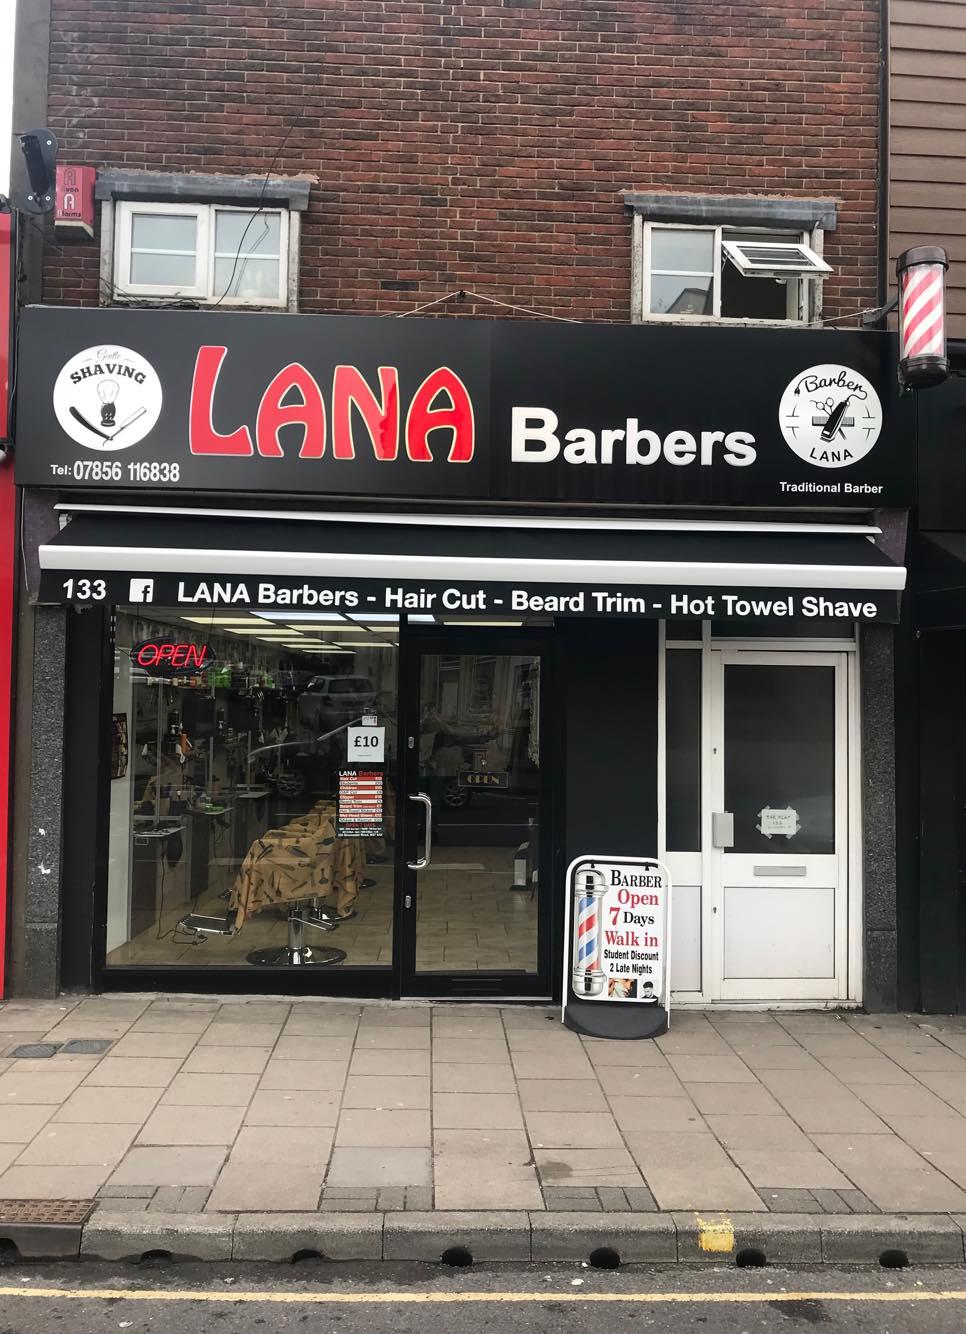 Lana Barbers